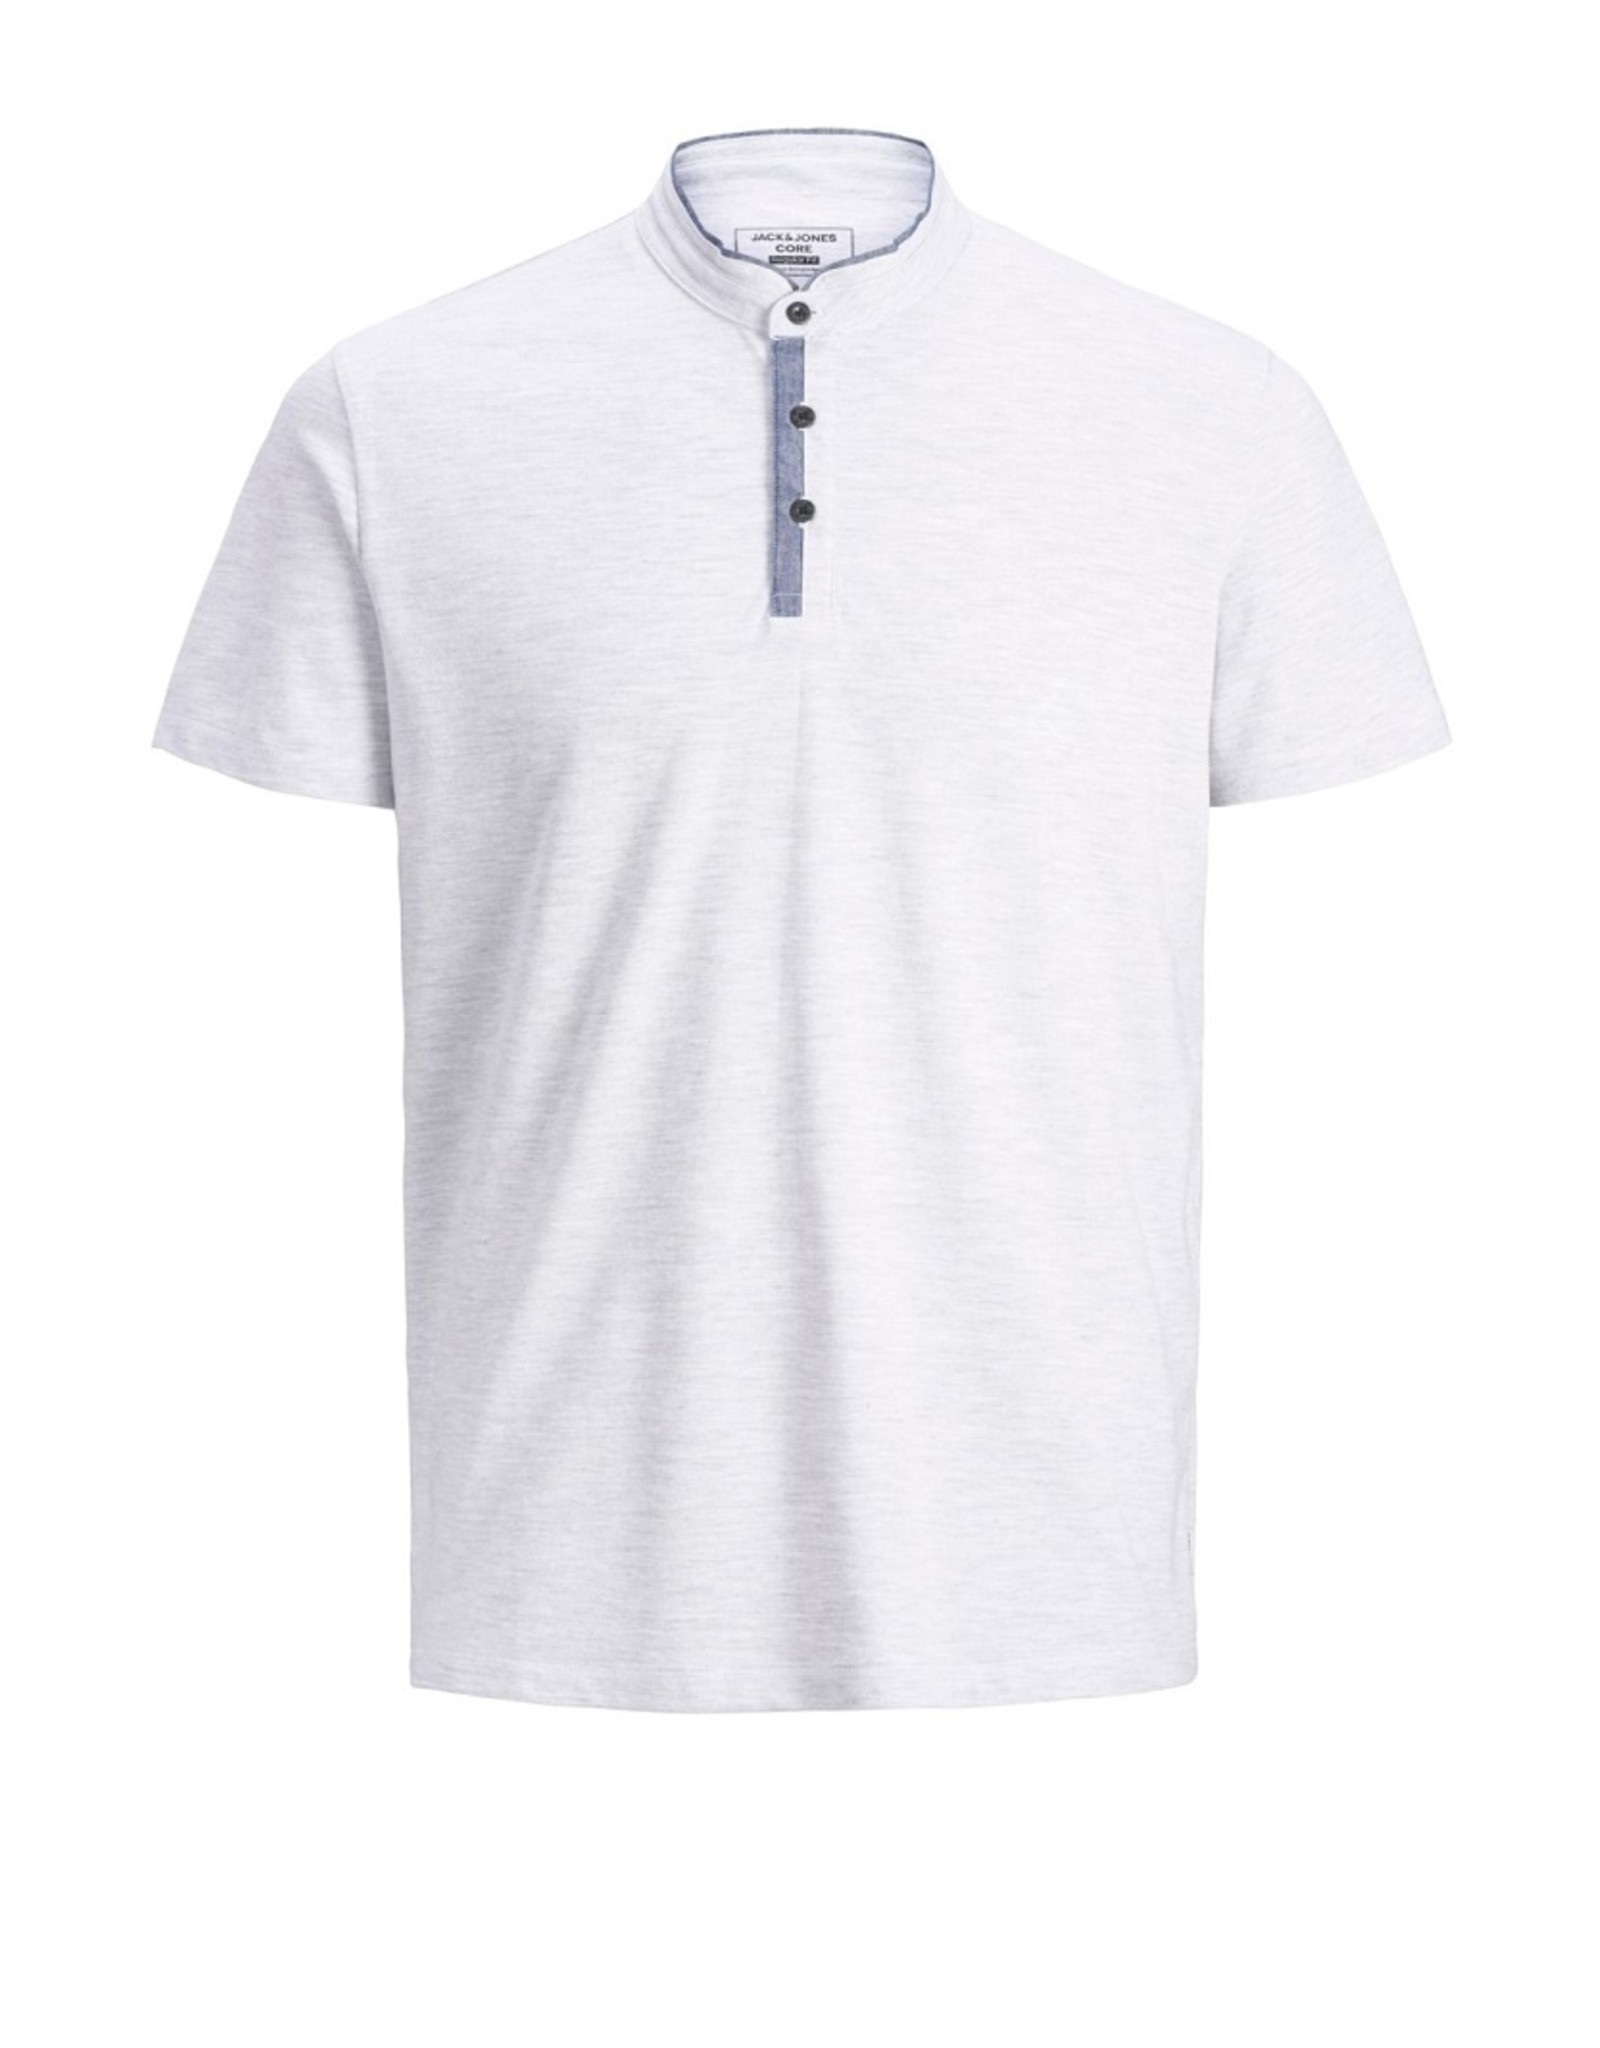 Jack & Jones Jack & Jones Short Sleeve No Collar Polo